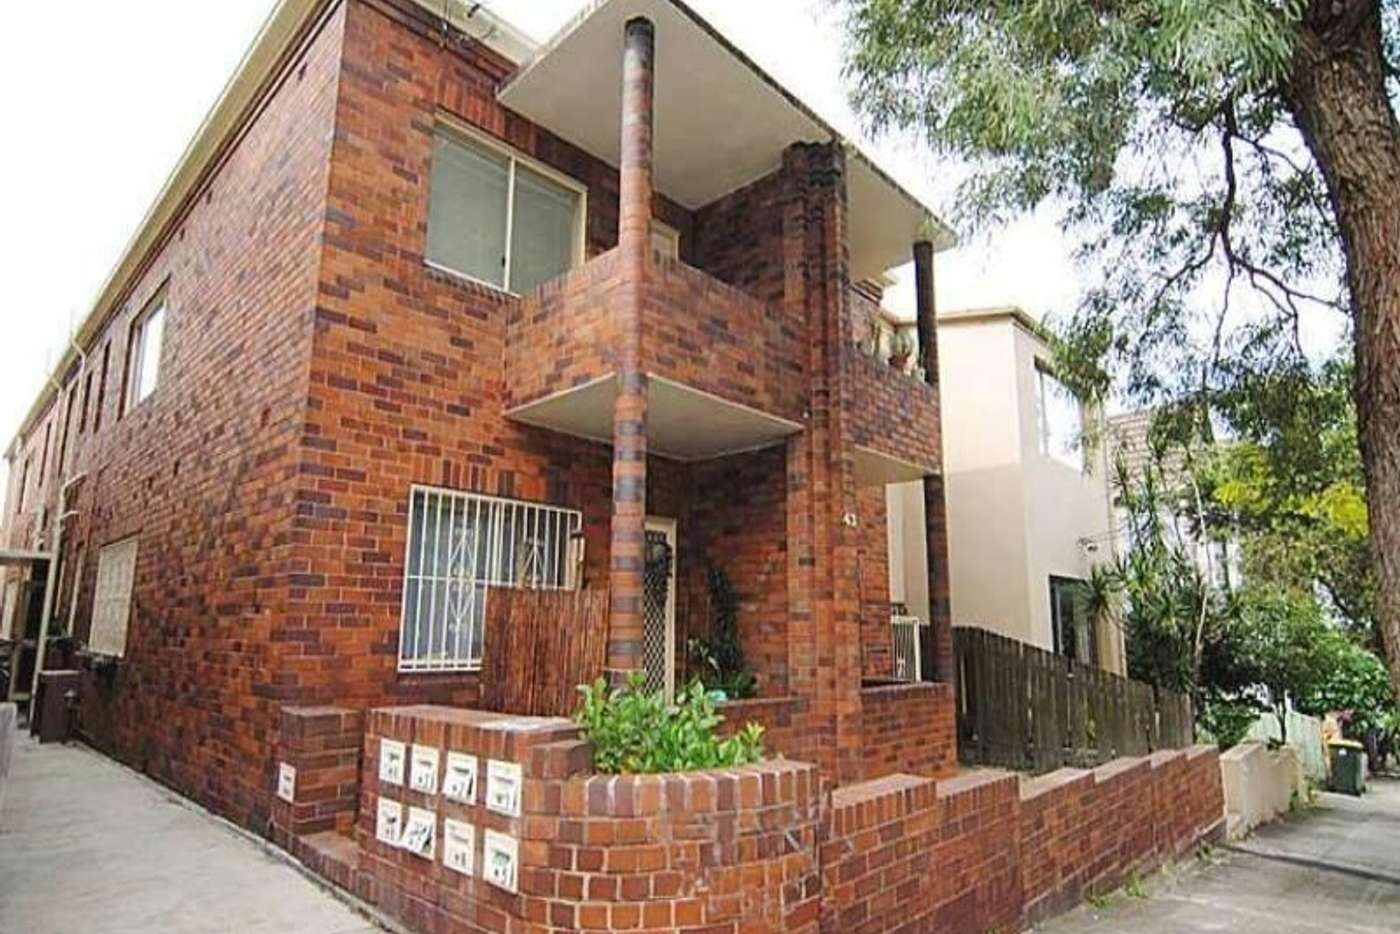 Main view of Homely apartment listing, 5/43 John Street, Petersham NSW 2049